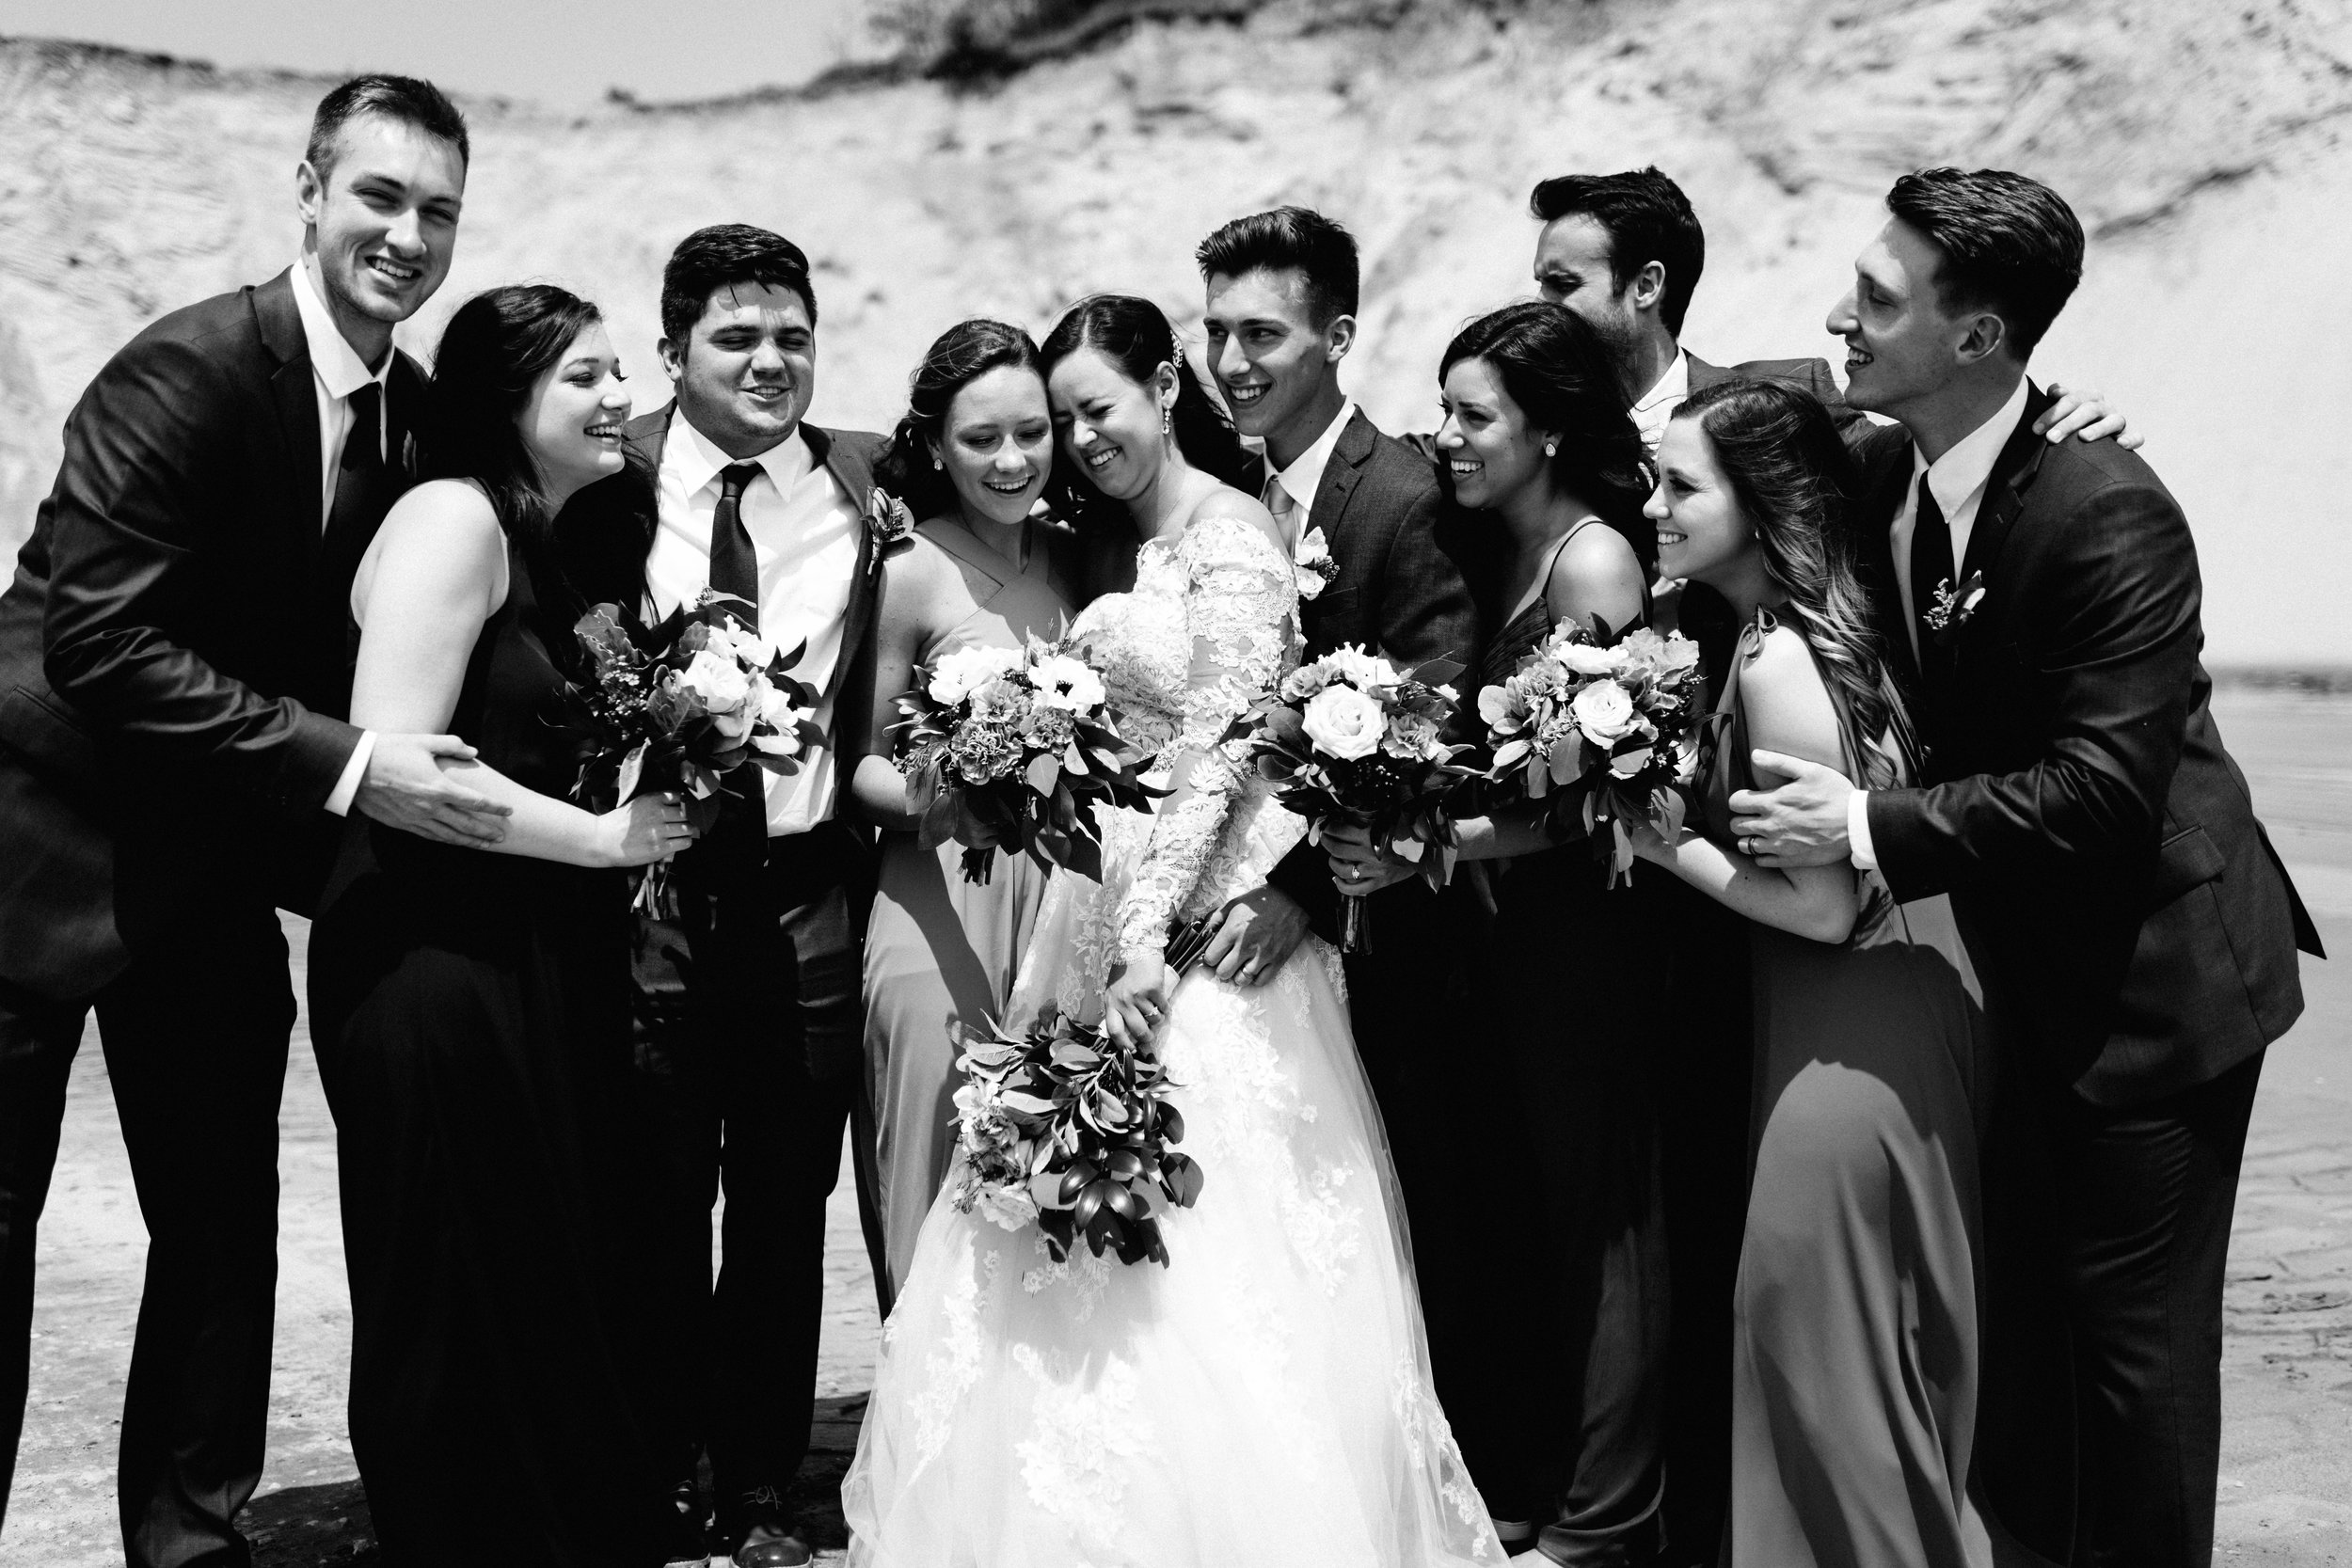 GRAYCENTOMHAMILTON-GRAND-RAPIDS-WEDDING-PHOTOGRAPHY-34.jpg